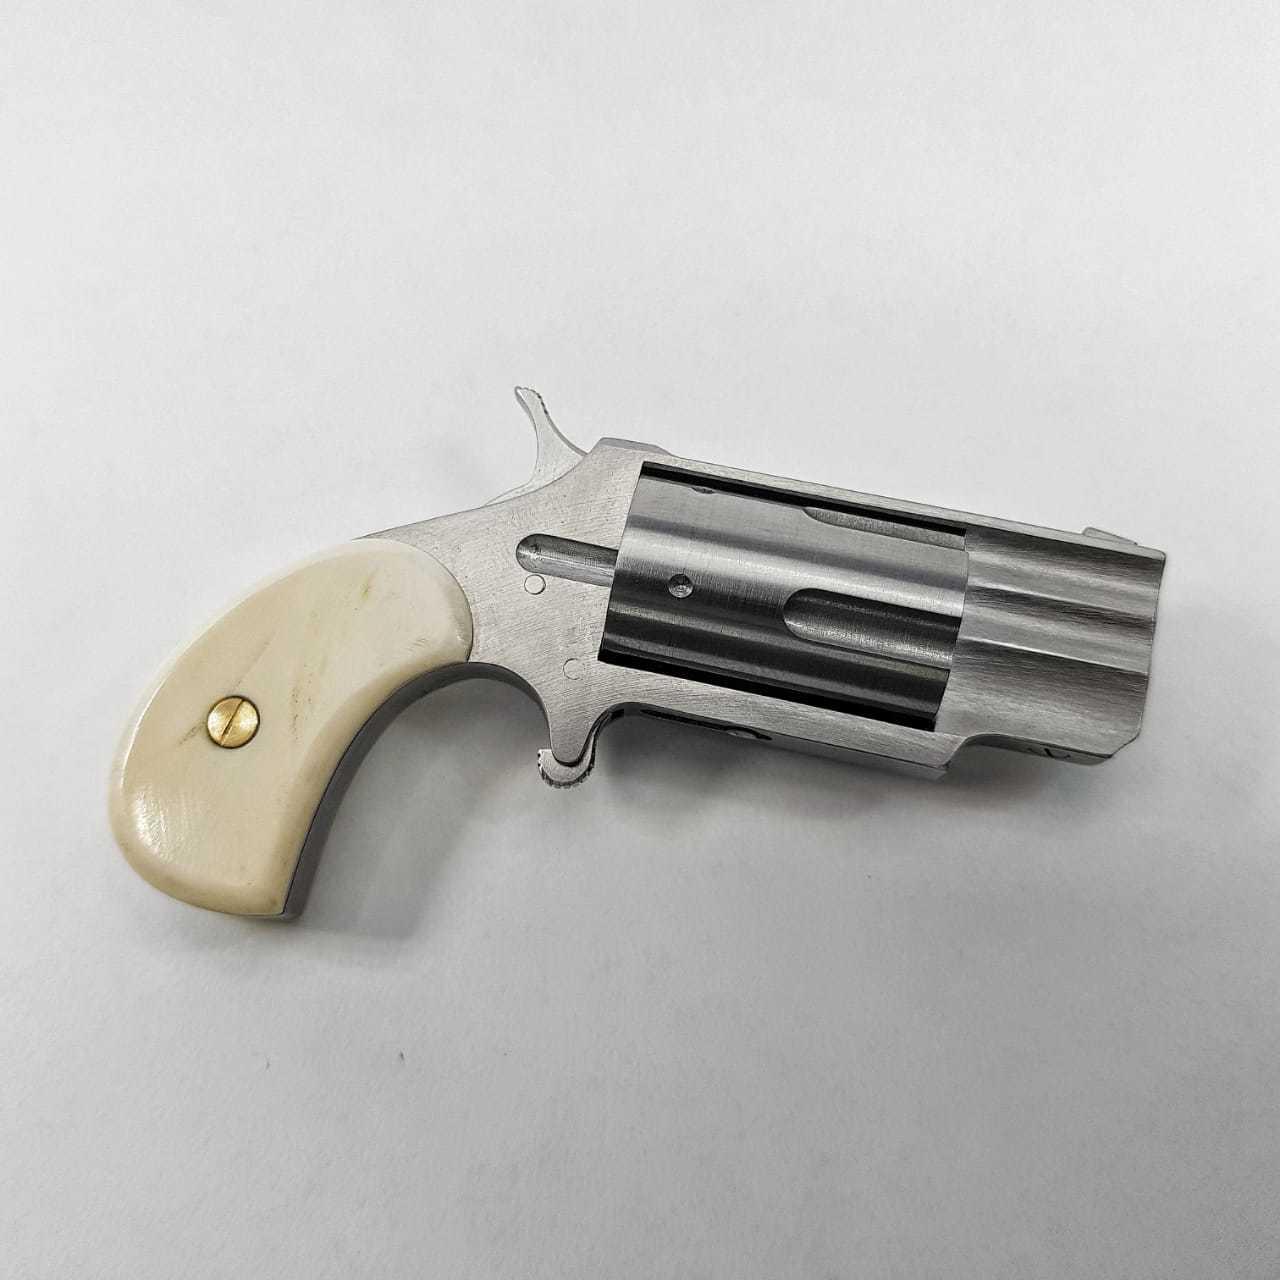 2,5mm NAA PUG revolver